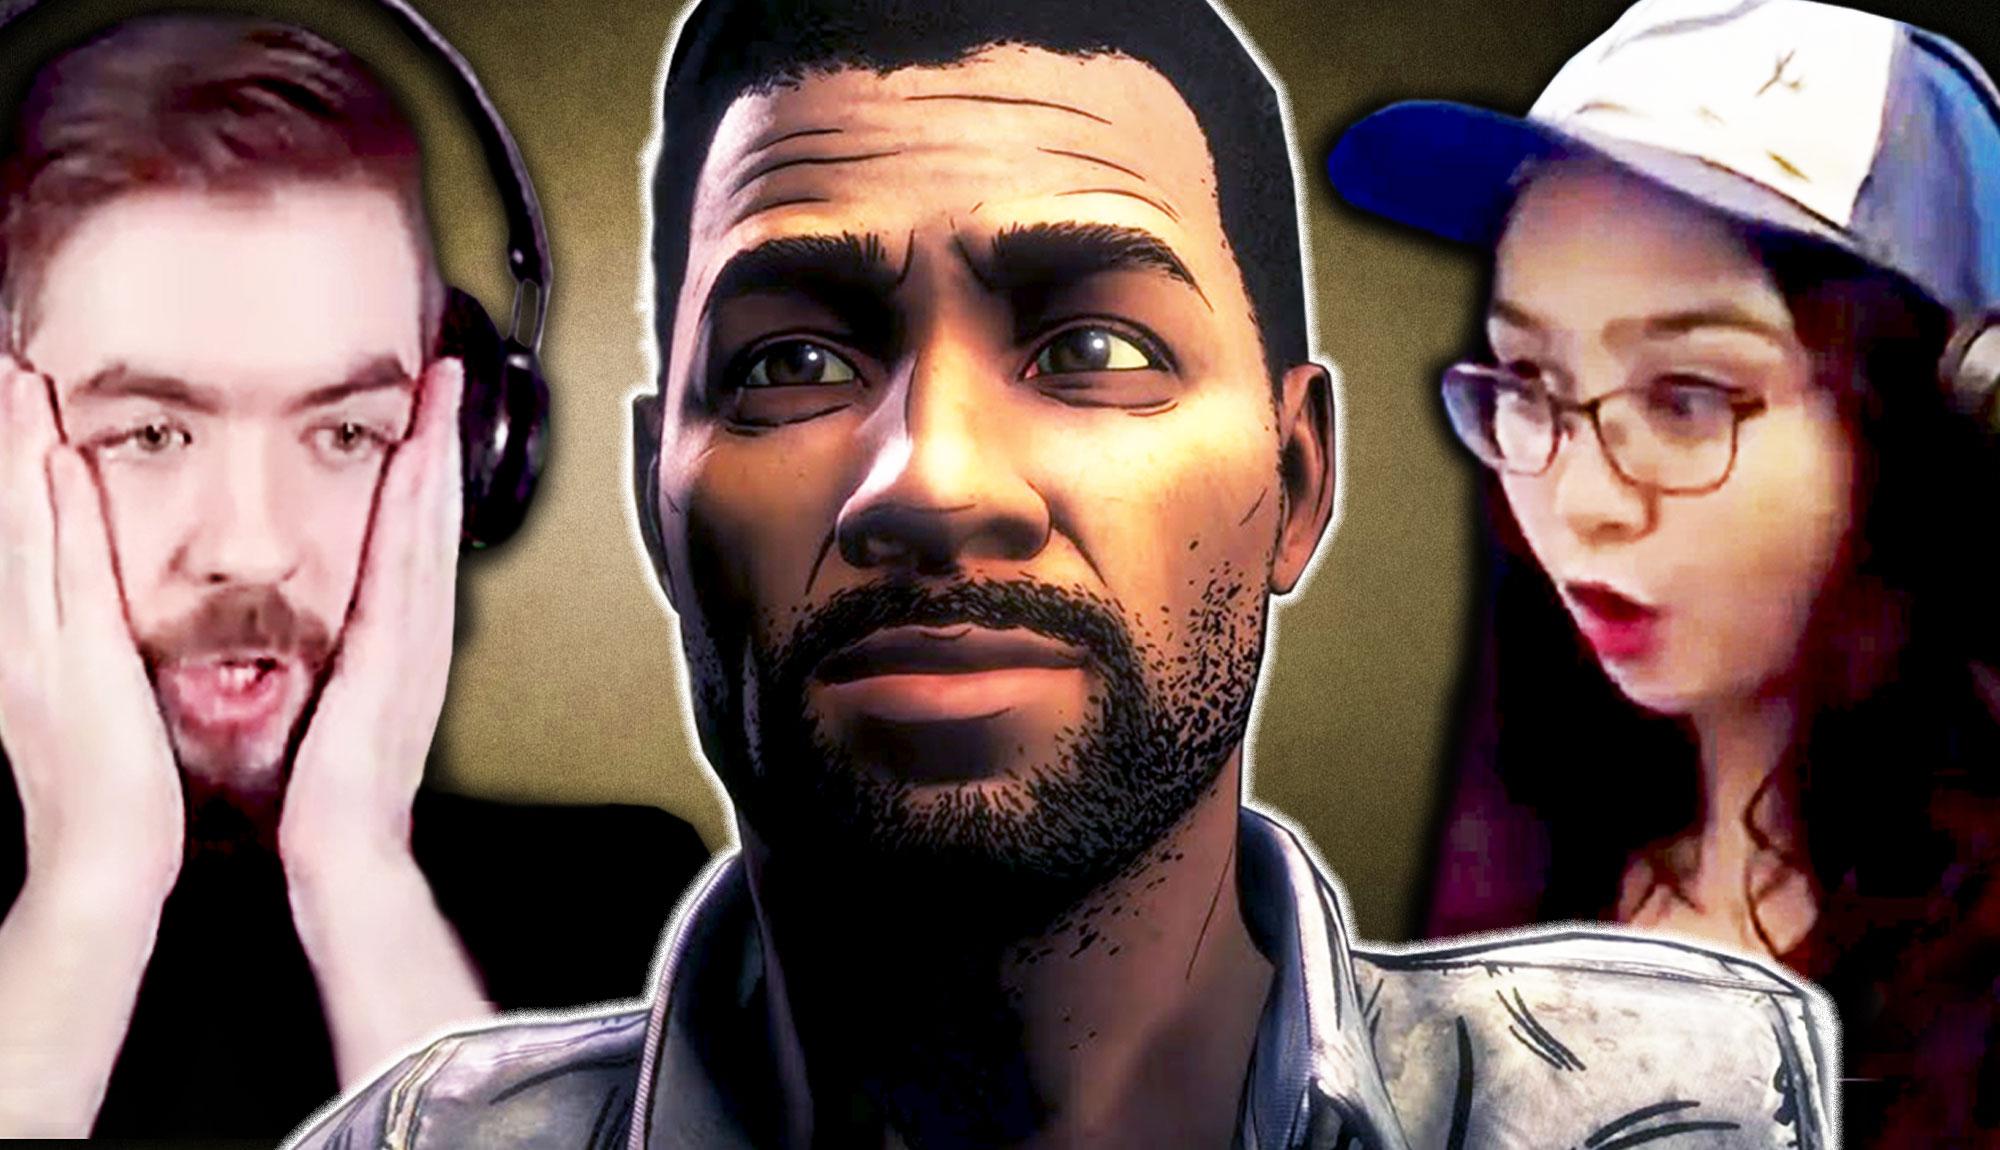 Gamers React To Telltale's The Walking Dead: The Final Season (Episode 403)